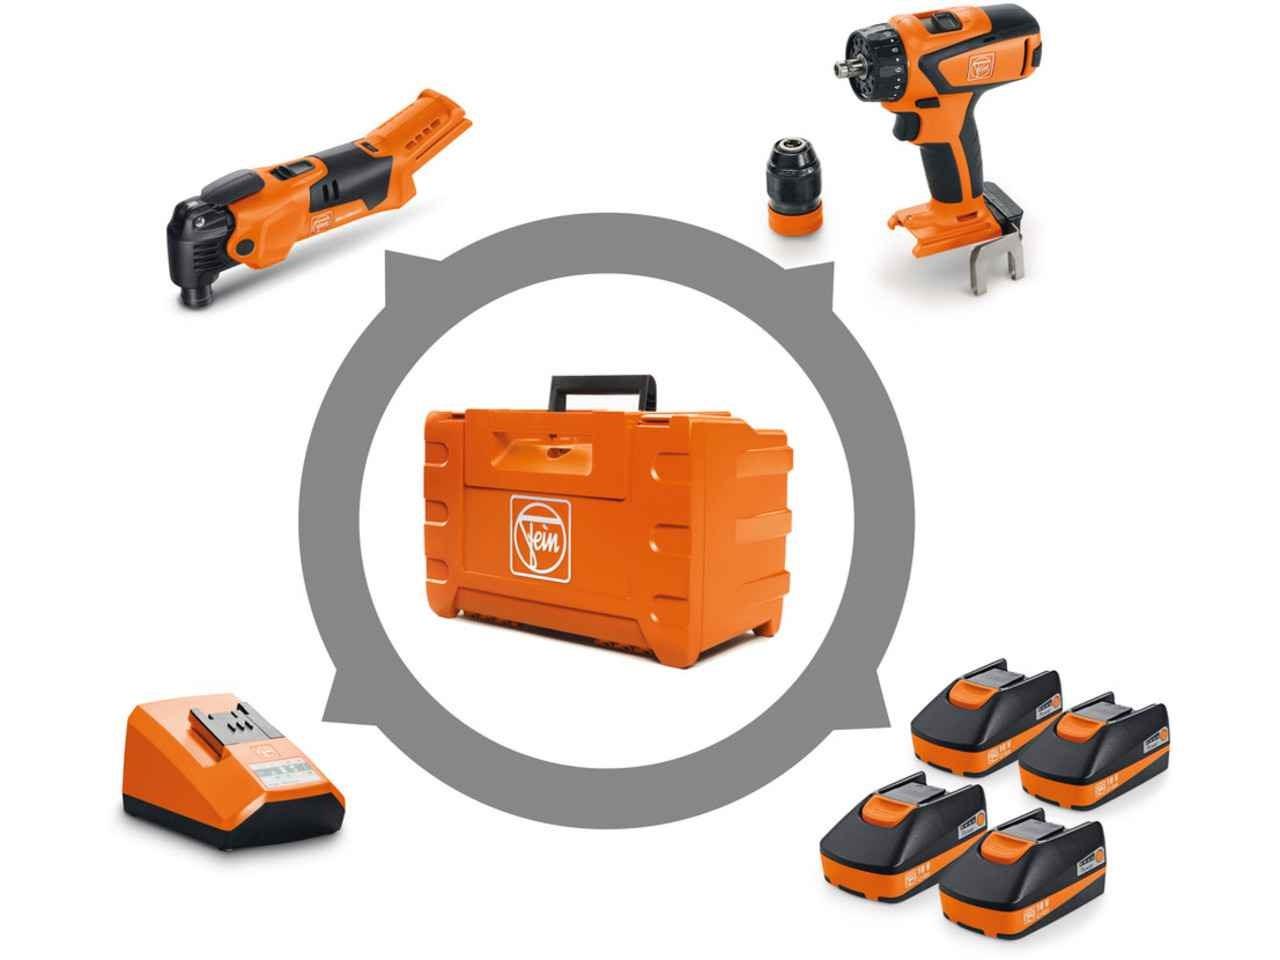 fein 71901761240 18v 4x2.5ah 2pc drill multi tool combo kit